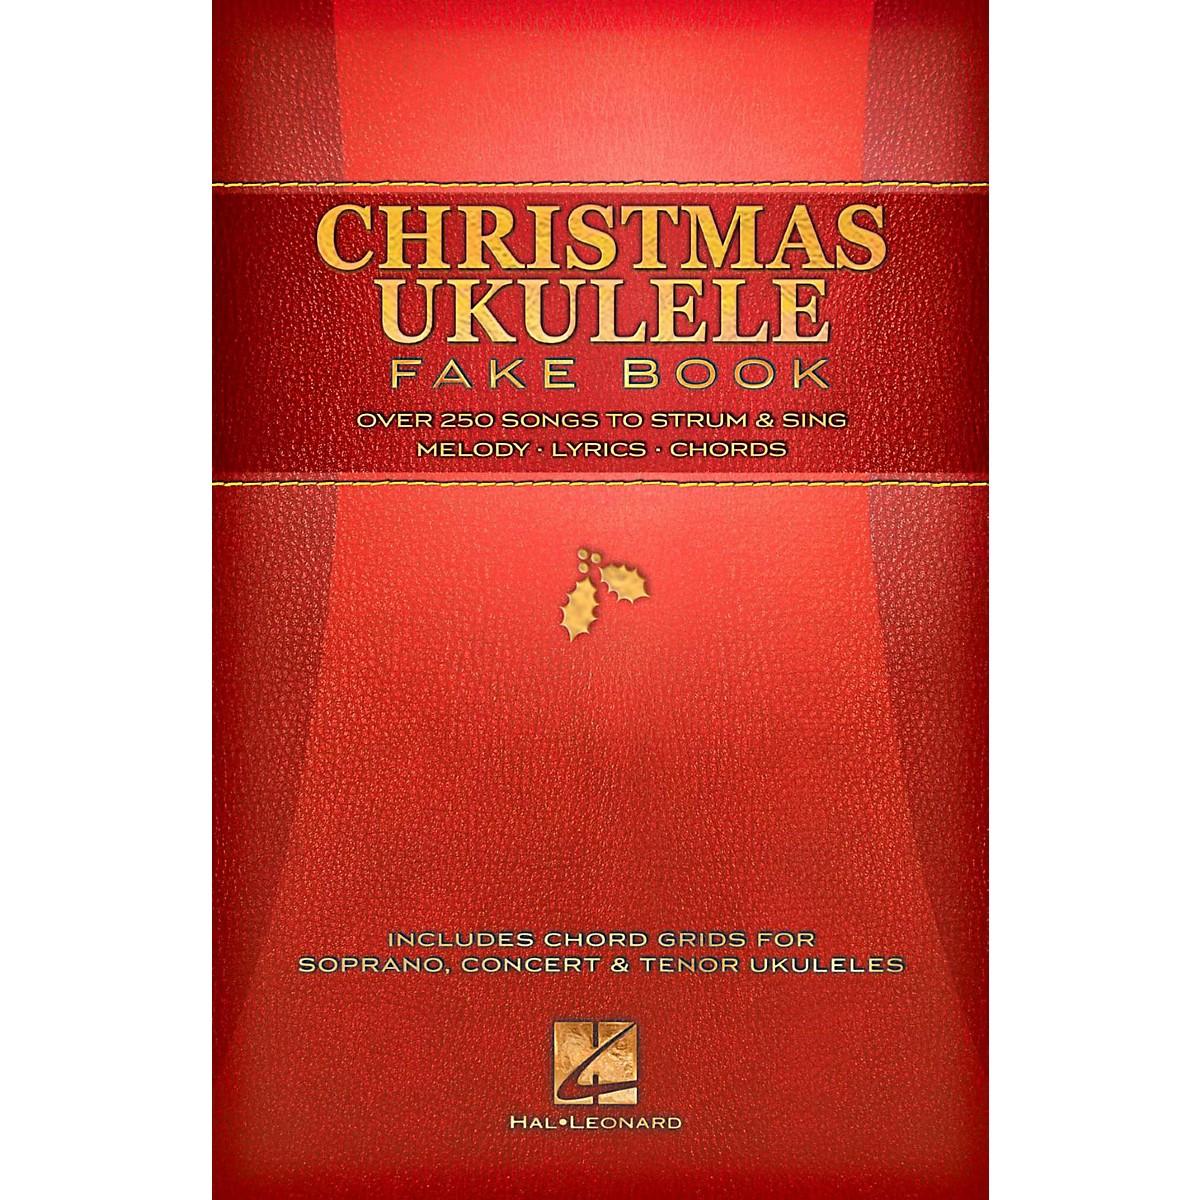 Hal Leonard Christmas Ukulele Fake Book